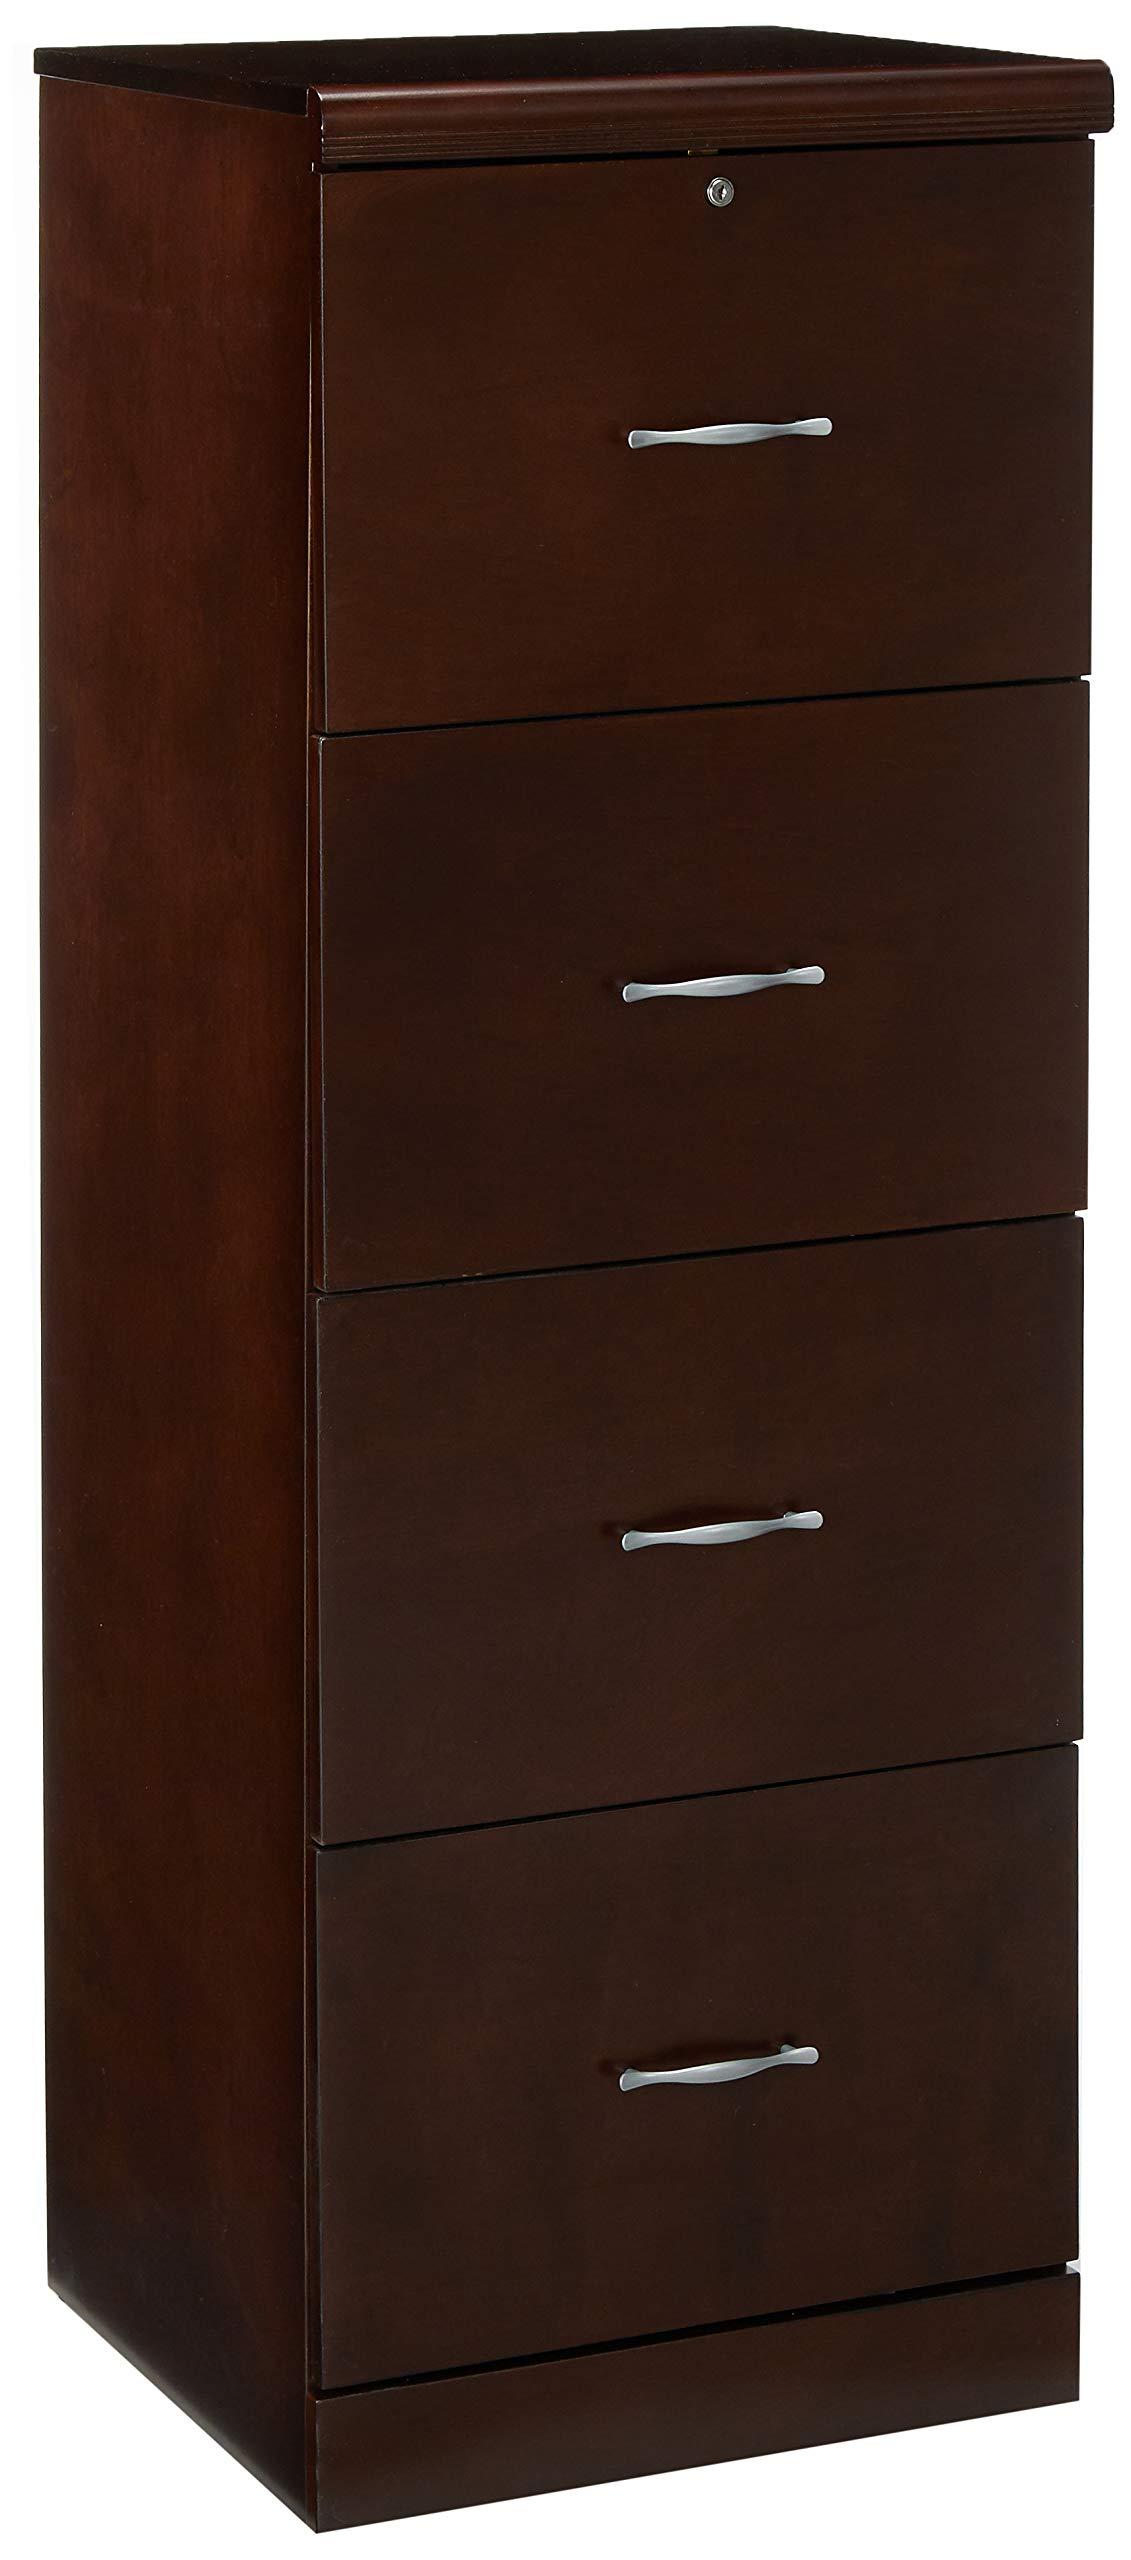 Z-Line Designs ZL8880-24VFU 4-Drawer Vertical File Cabinet, Espresso